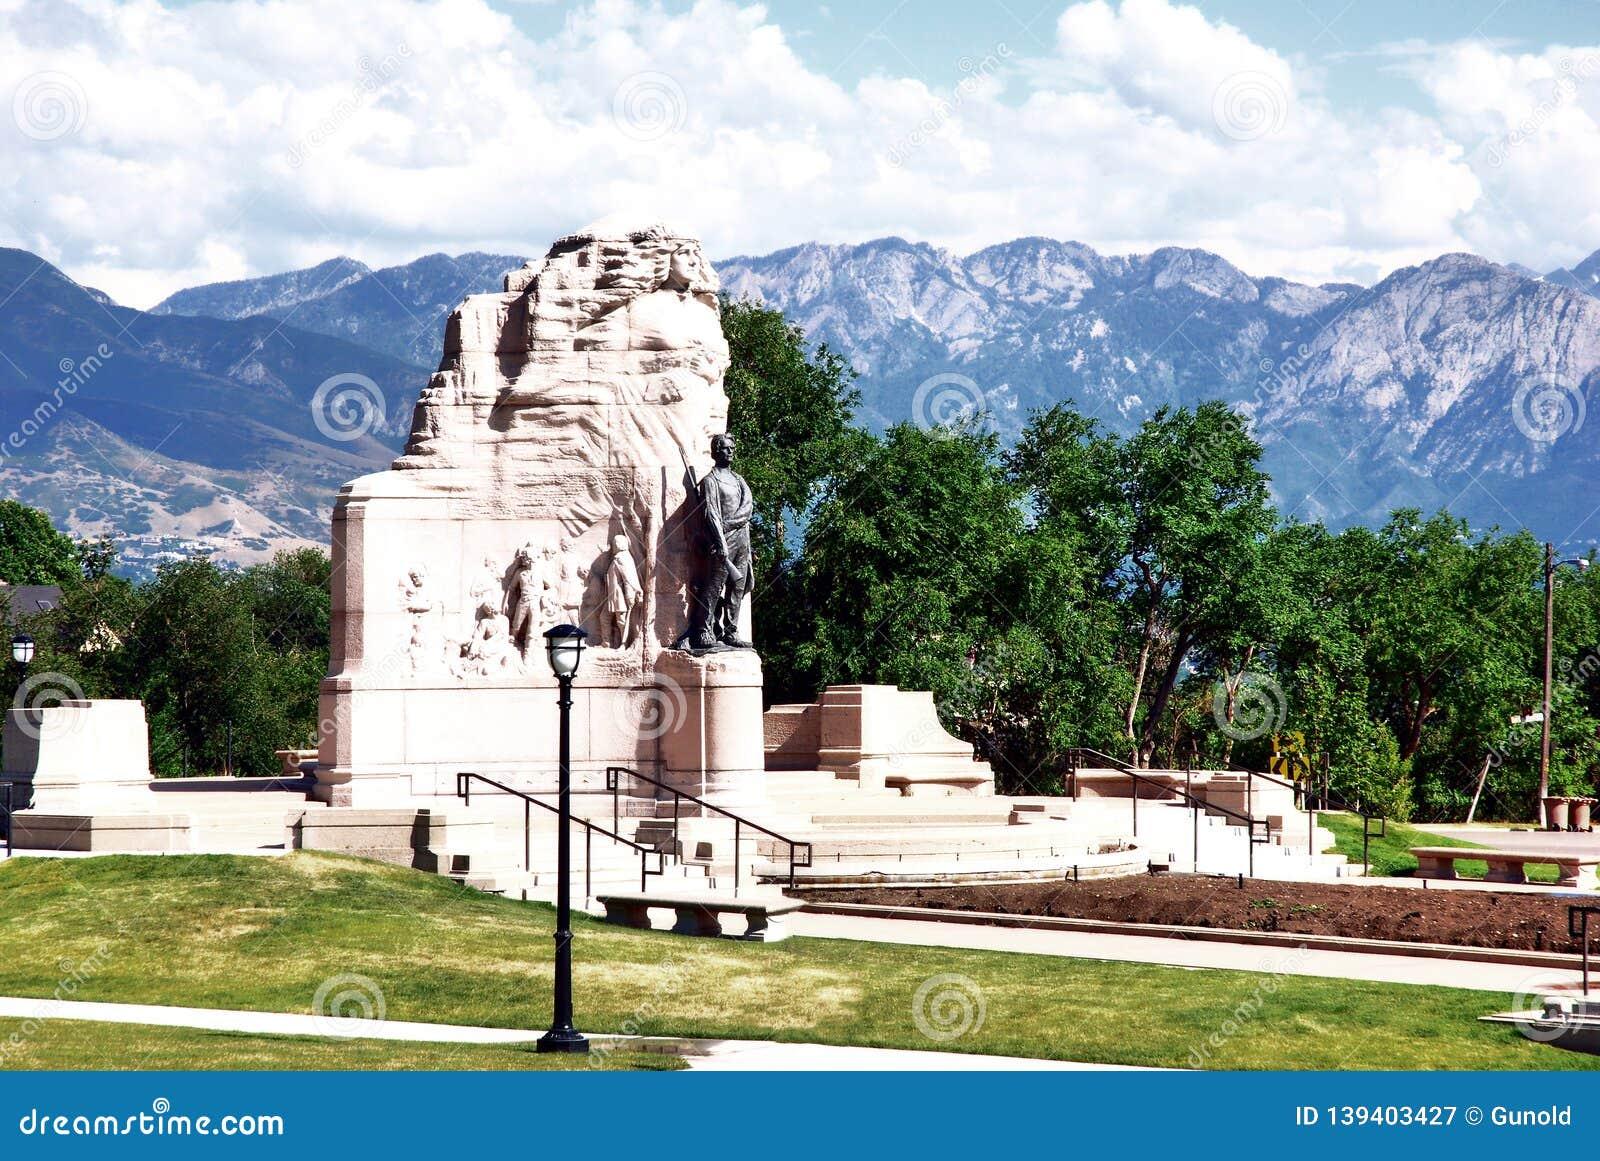 Panoramio - Photo of Mormon Battalion Monument, Salt Lake